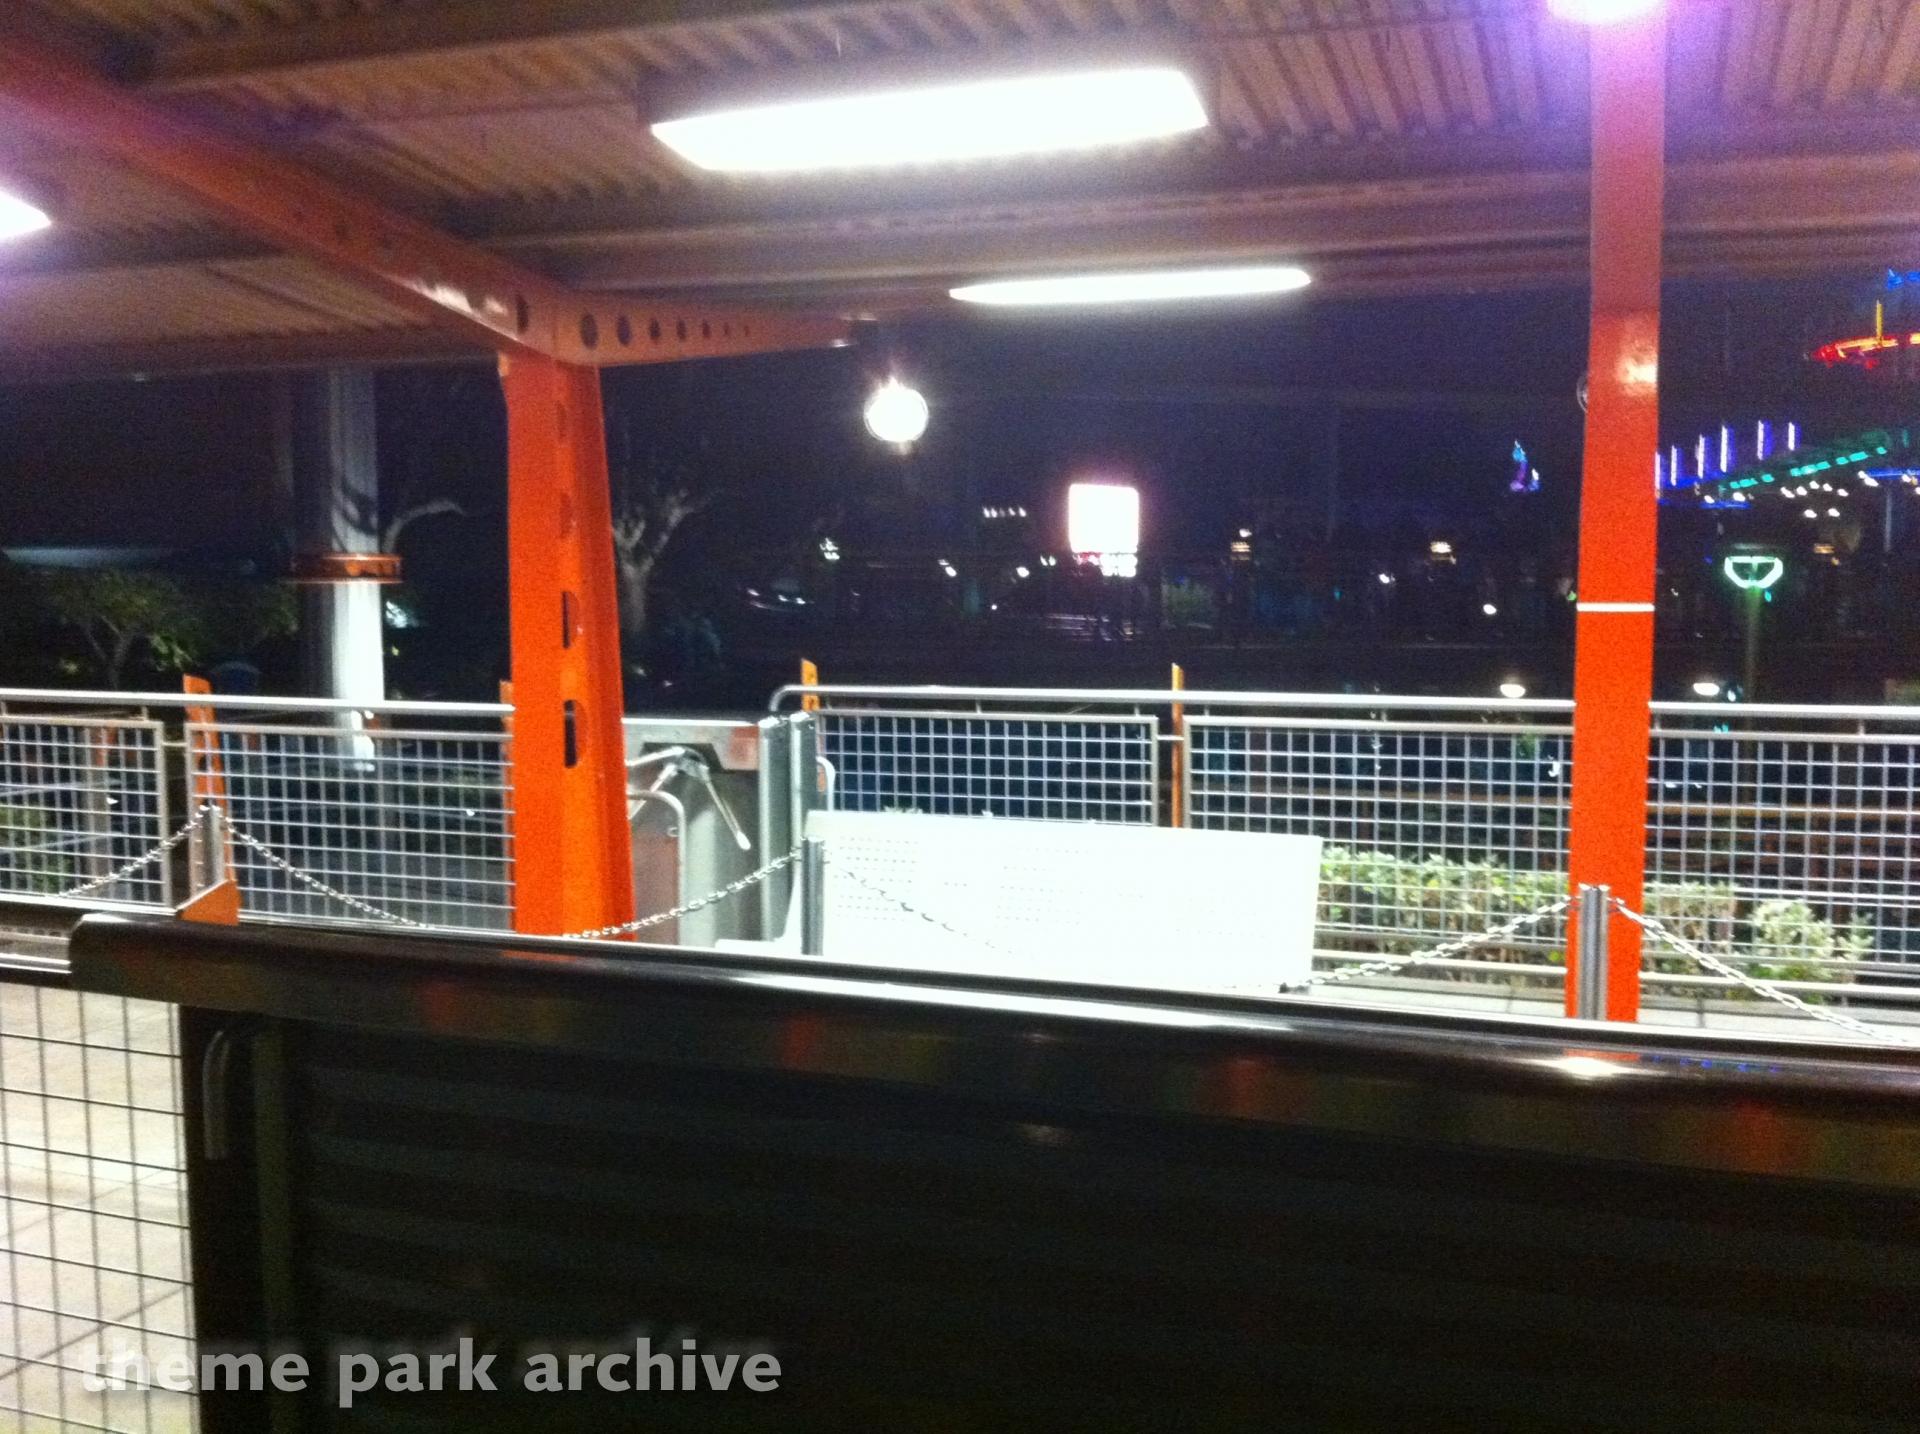 Disneyland Monorail at Disneyland